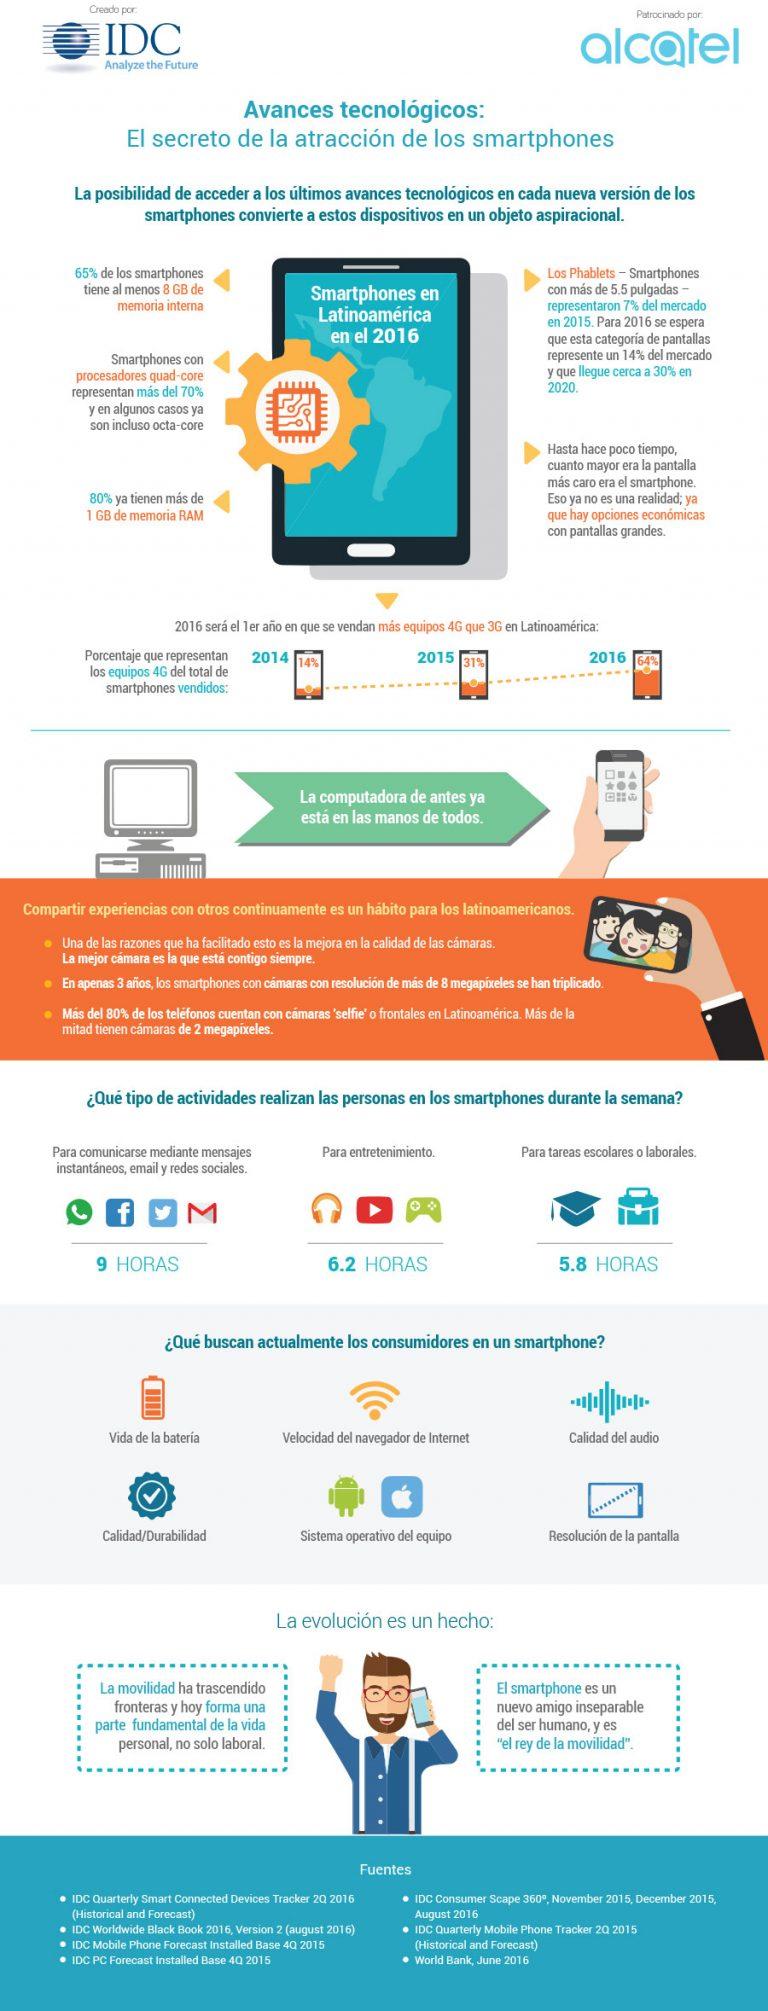 la17000-latin-america_infographics_el-camino-hacia-la-movilidad_2016_alcatel_secc-b